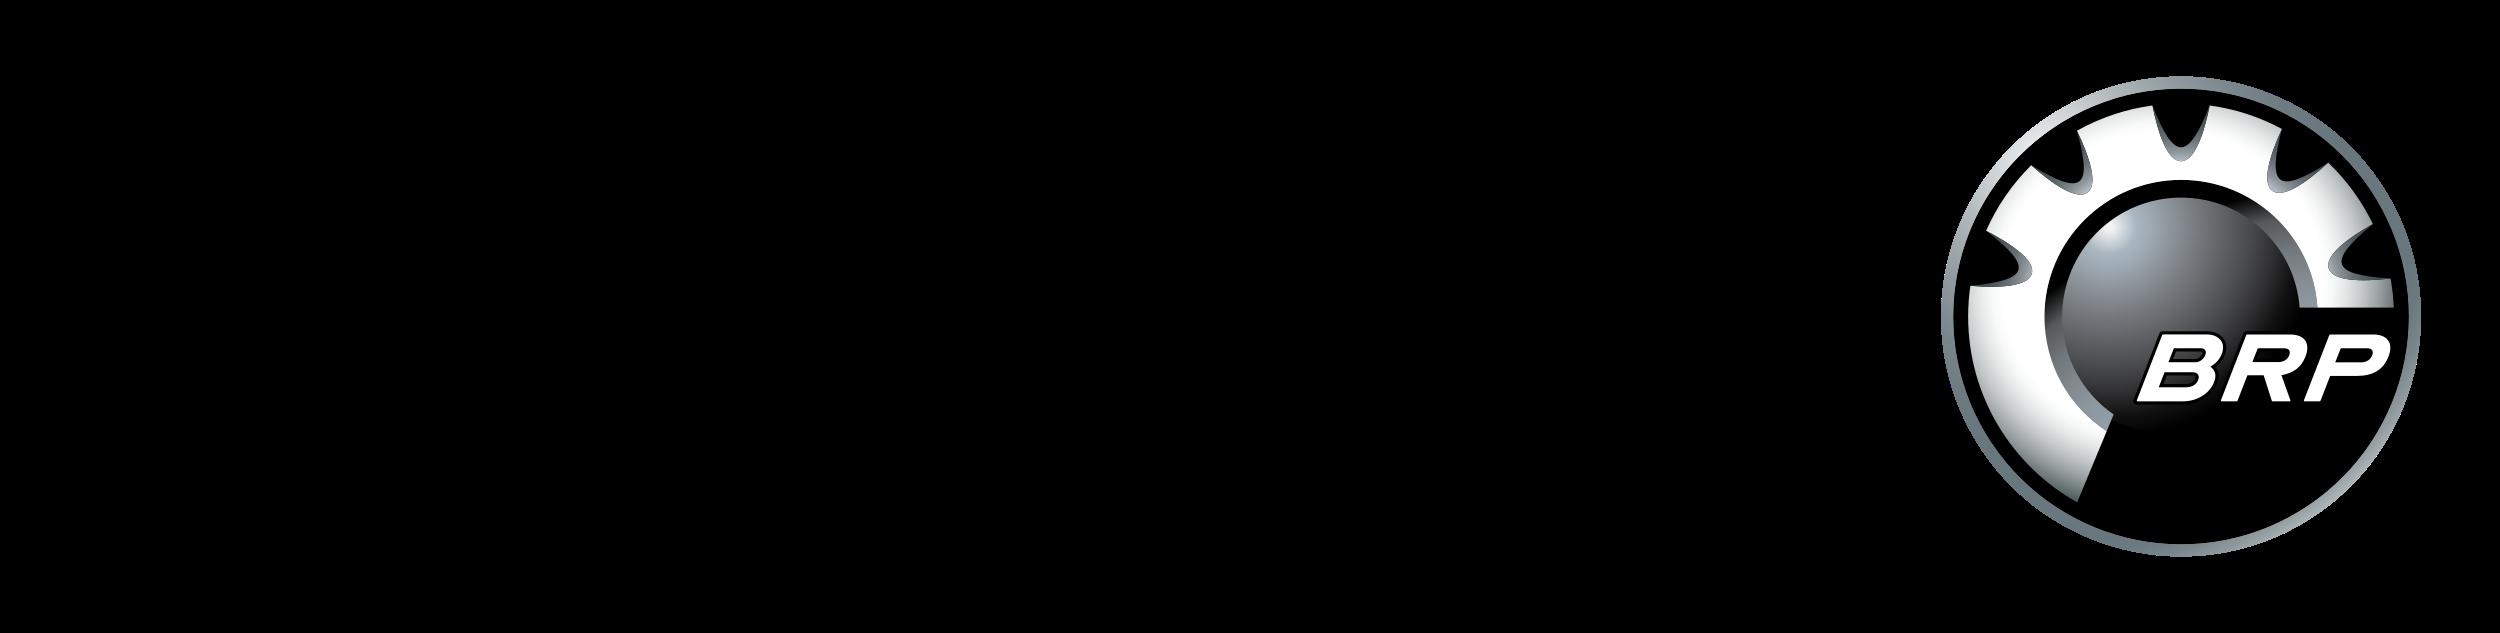 Evinrude brand logo